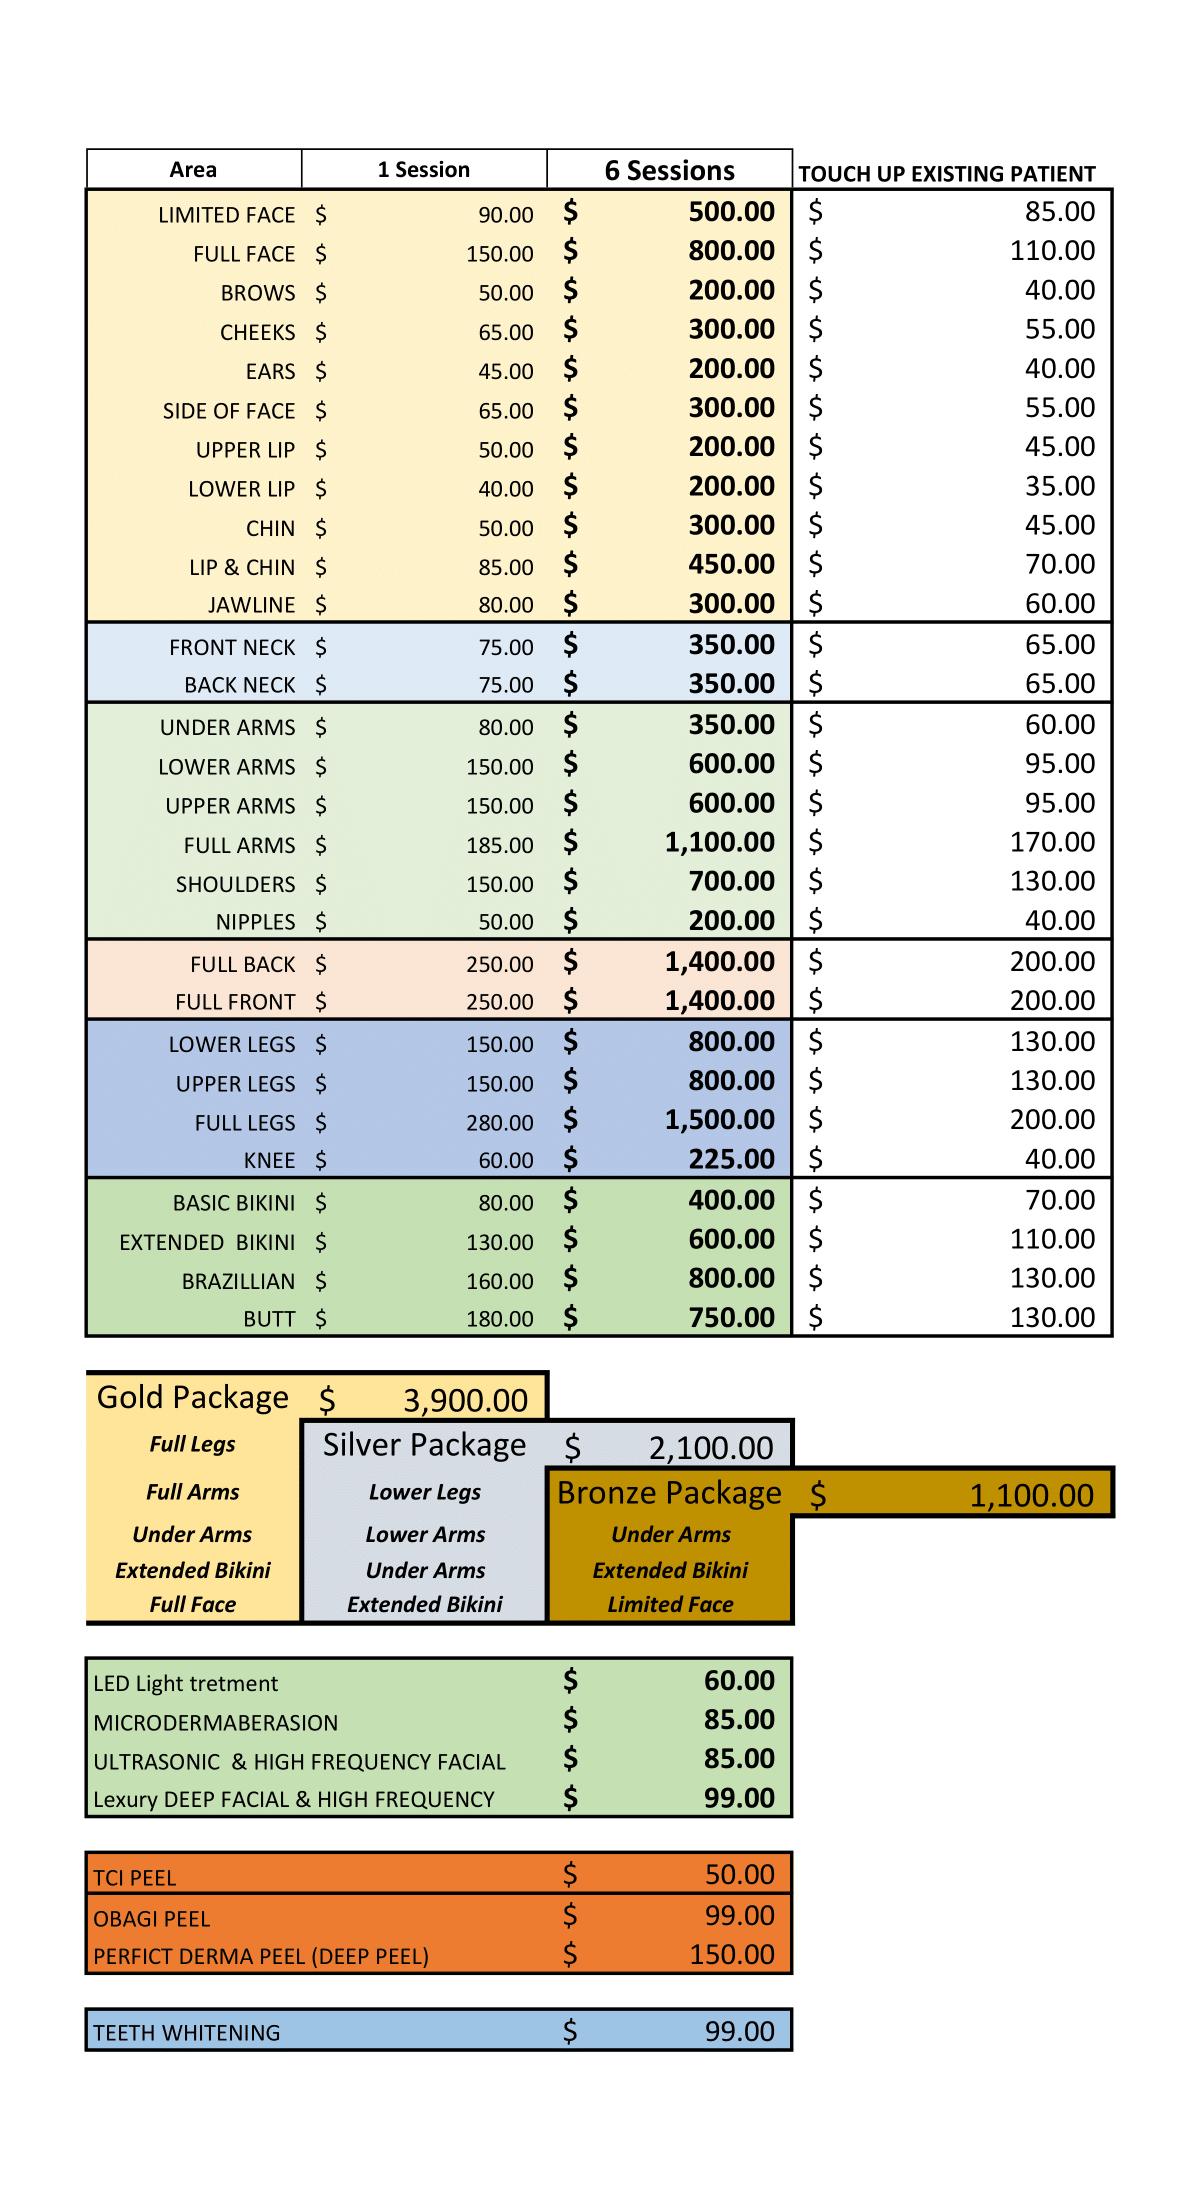 SSLC PRICE LIST Spring21.xlsx - Sheet2-1